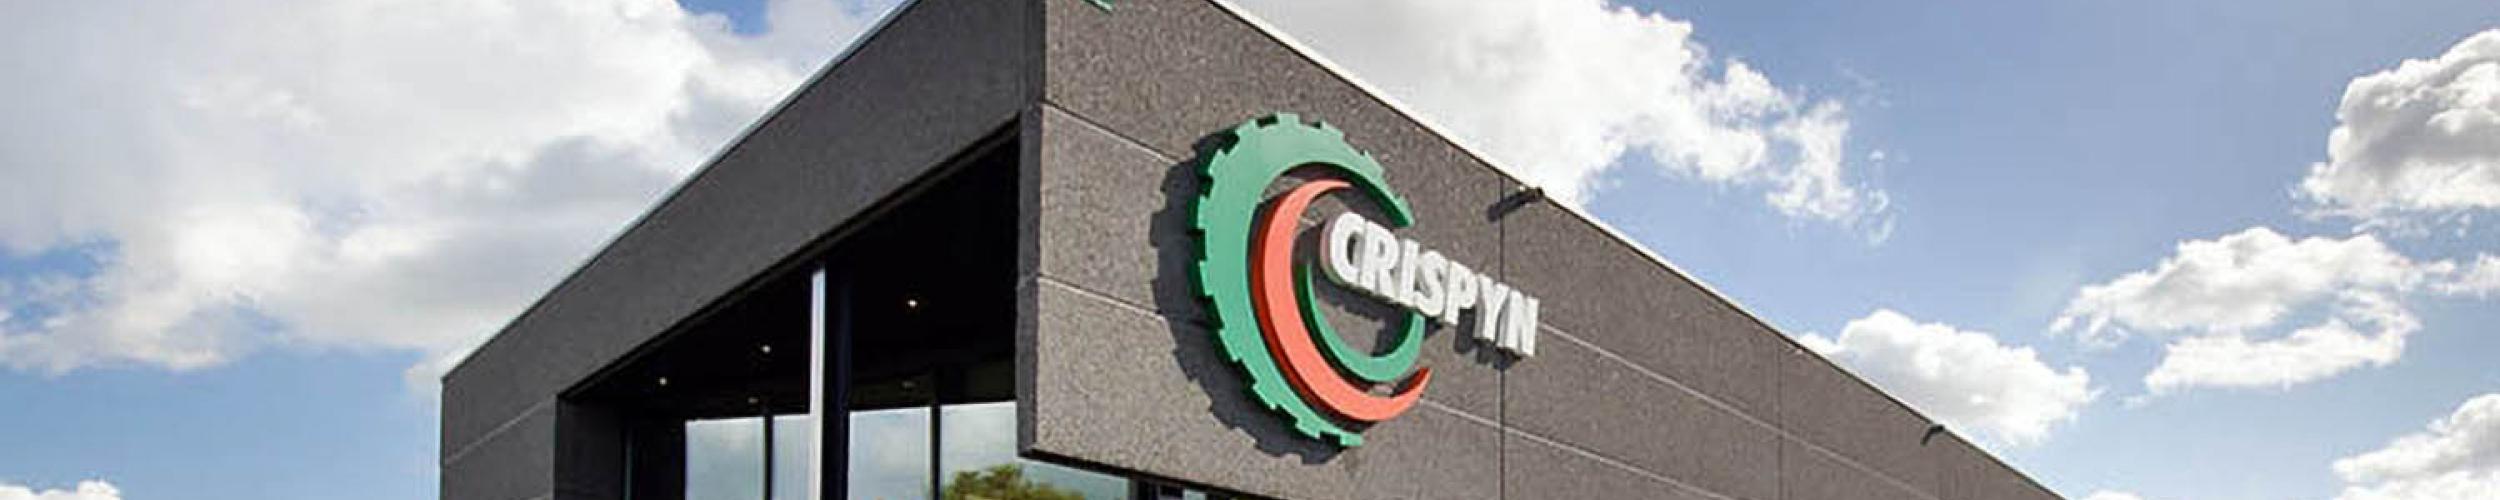 Produsoft vertegenwoordigd op Demodagen Crispyn